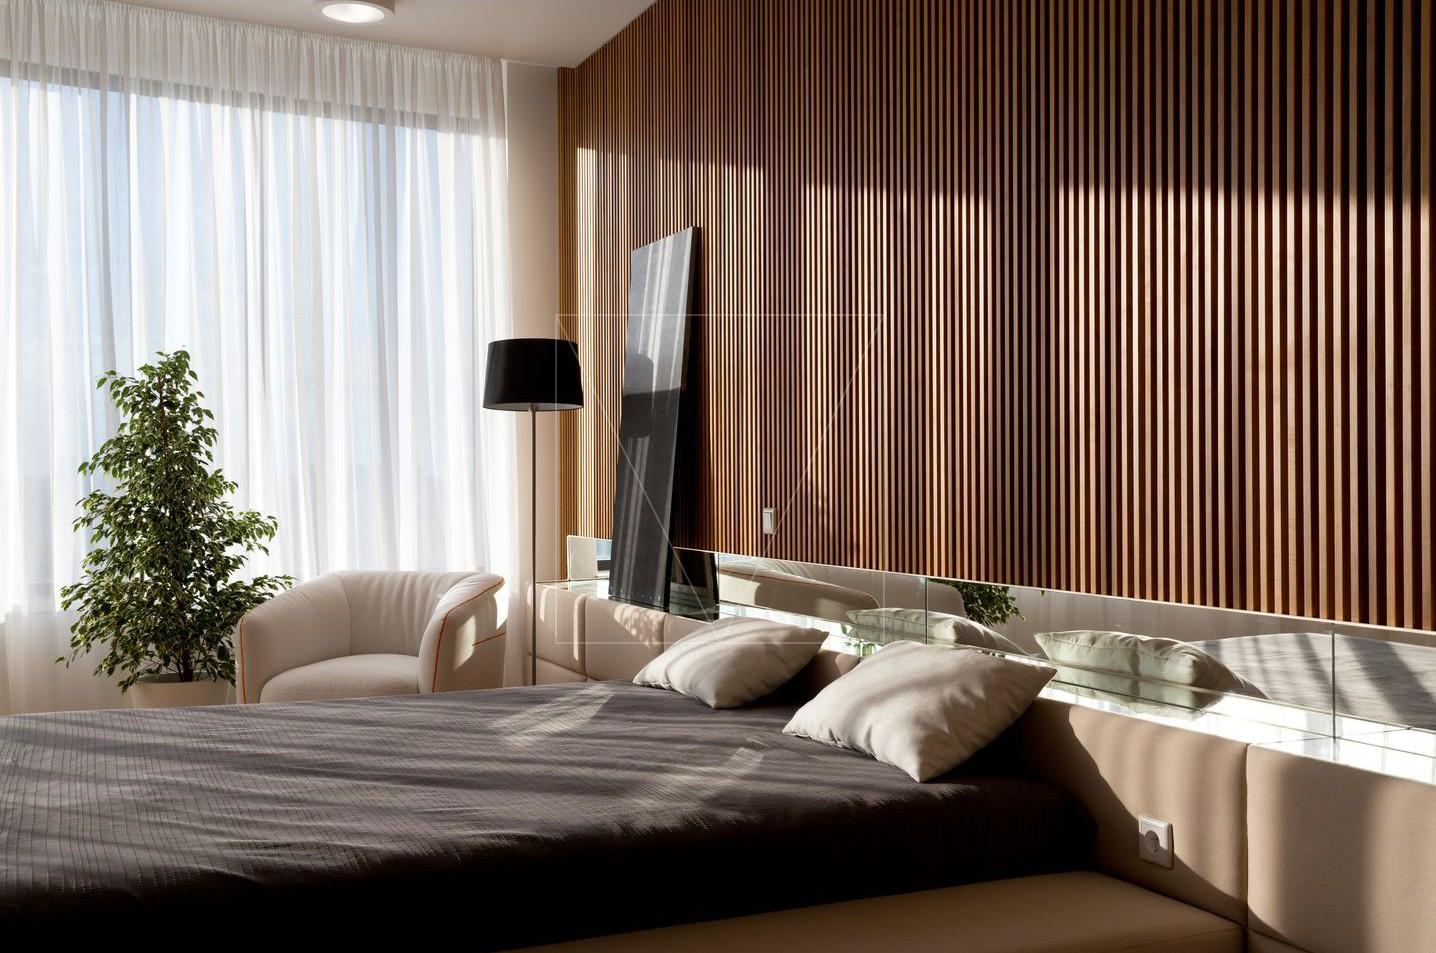 "7755 16 04 19 300 result e1492260493630 - Дизайн интерьера двухкомнатной квартиры ""Skyline минимализм"" by Sergey Makhno Architects"